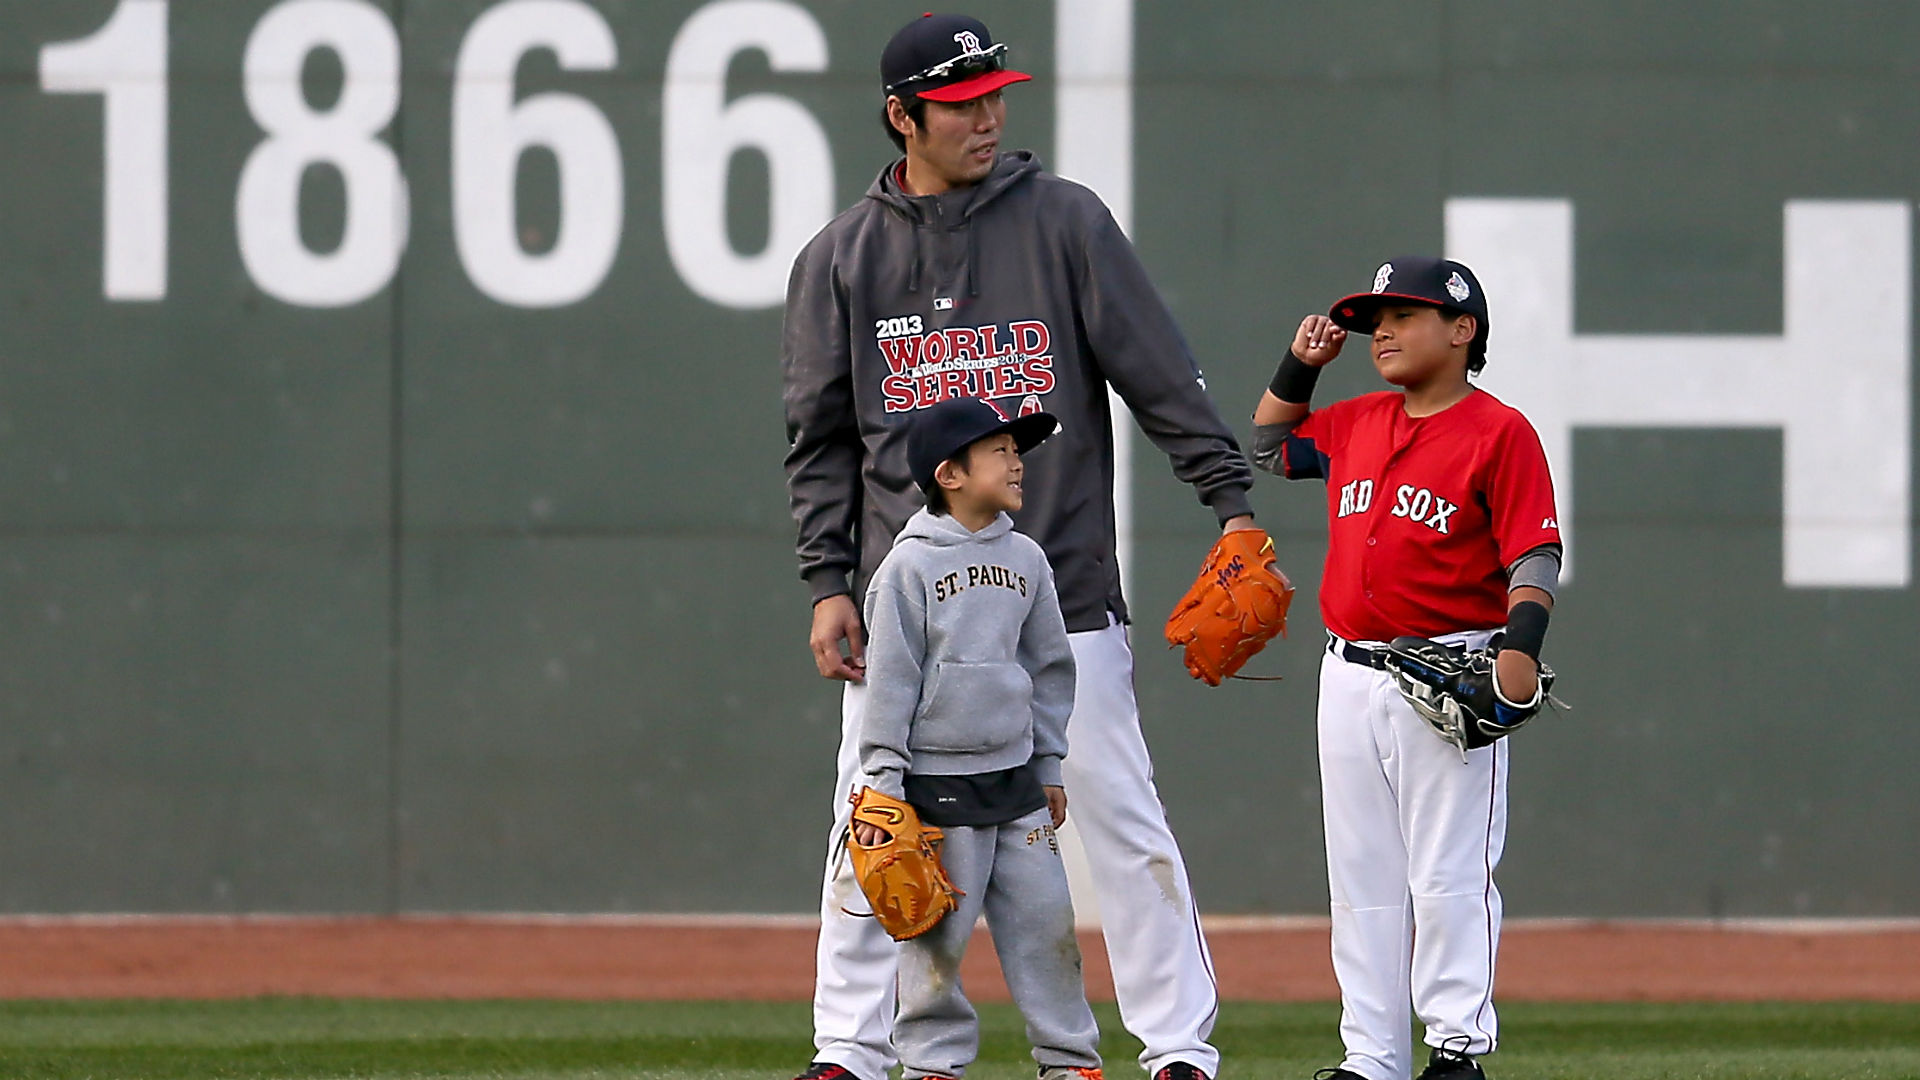 D Angelo Ortiz Teaching His Dad How To Nae Nae David Ortiz Aka Big Papi